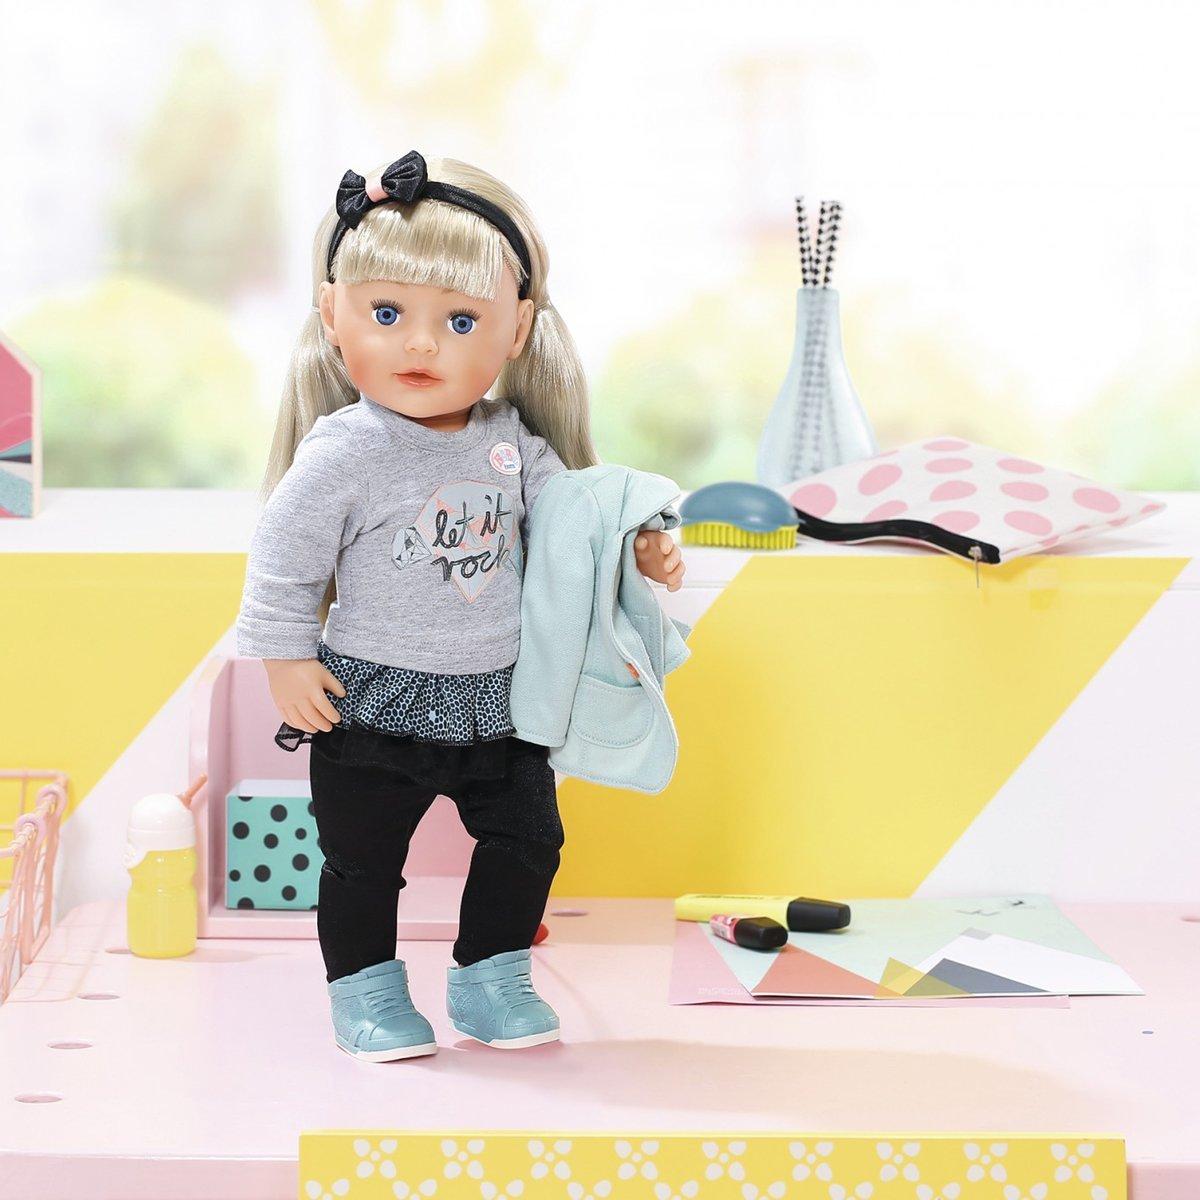 Купить Куклы и наборы, Кукла Baby Born Сестренка-модница, 43 см 824245 ТМ: BABY born